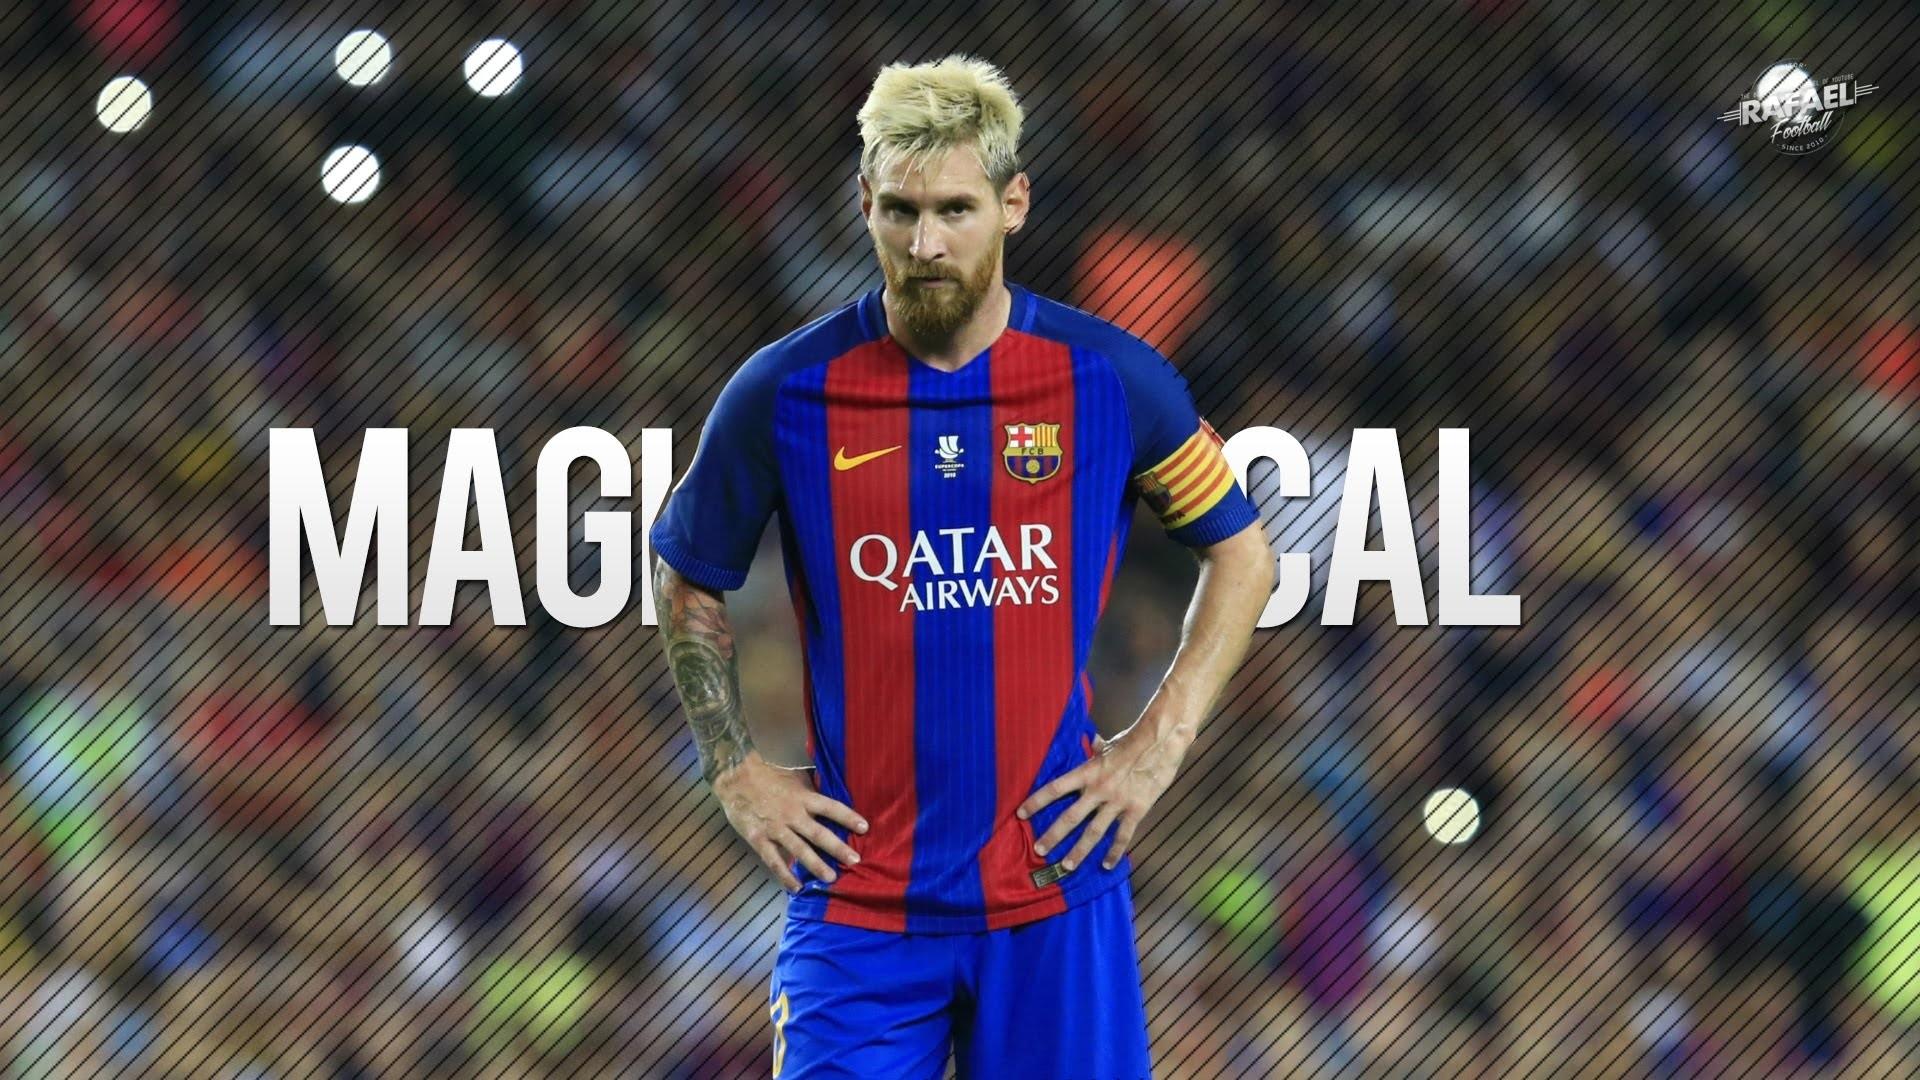 Lionel Messi Wallpaper HD (78+ Images